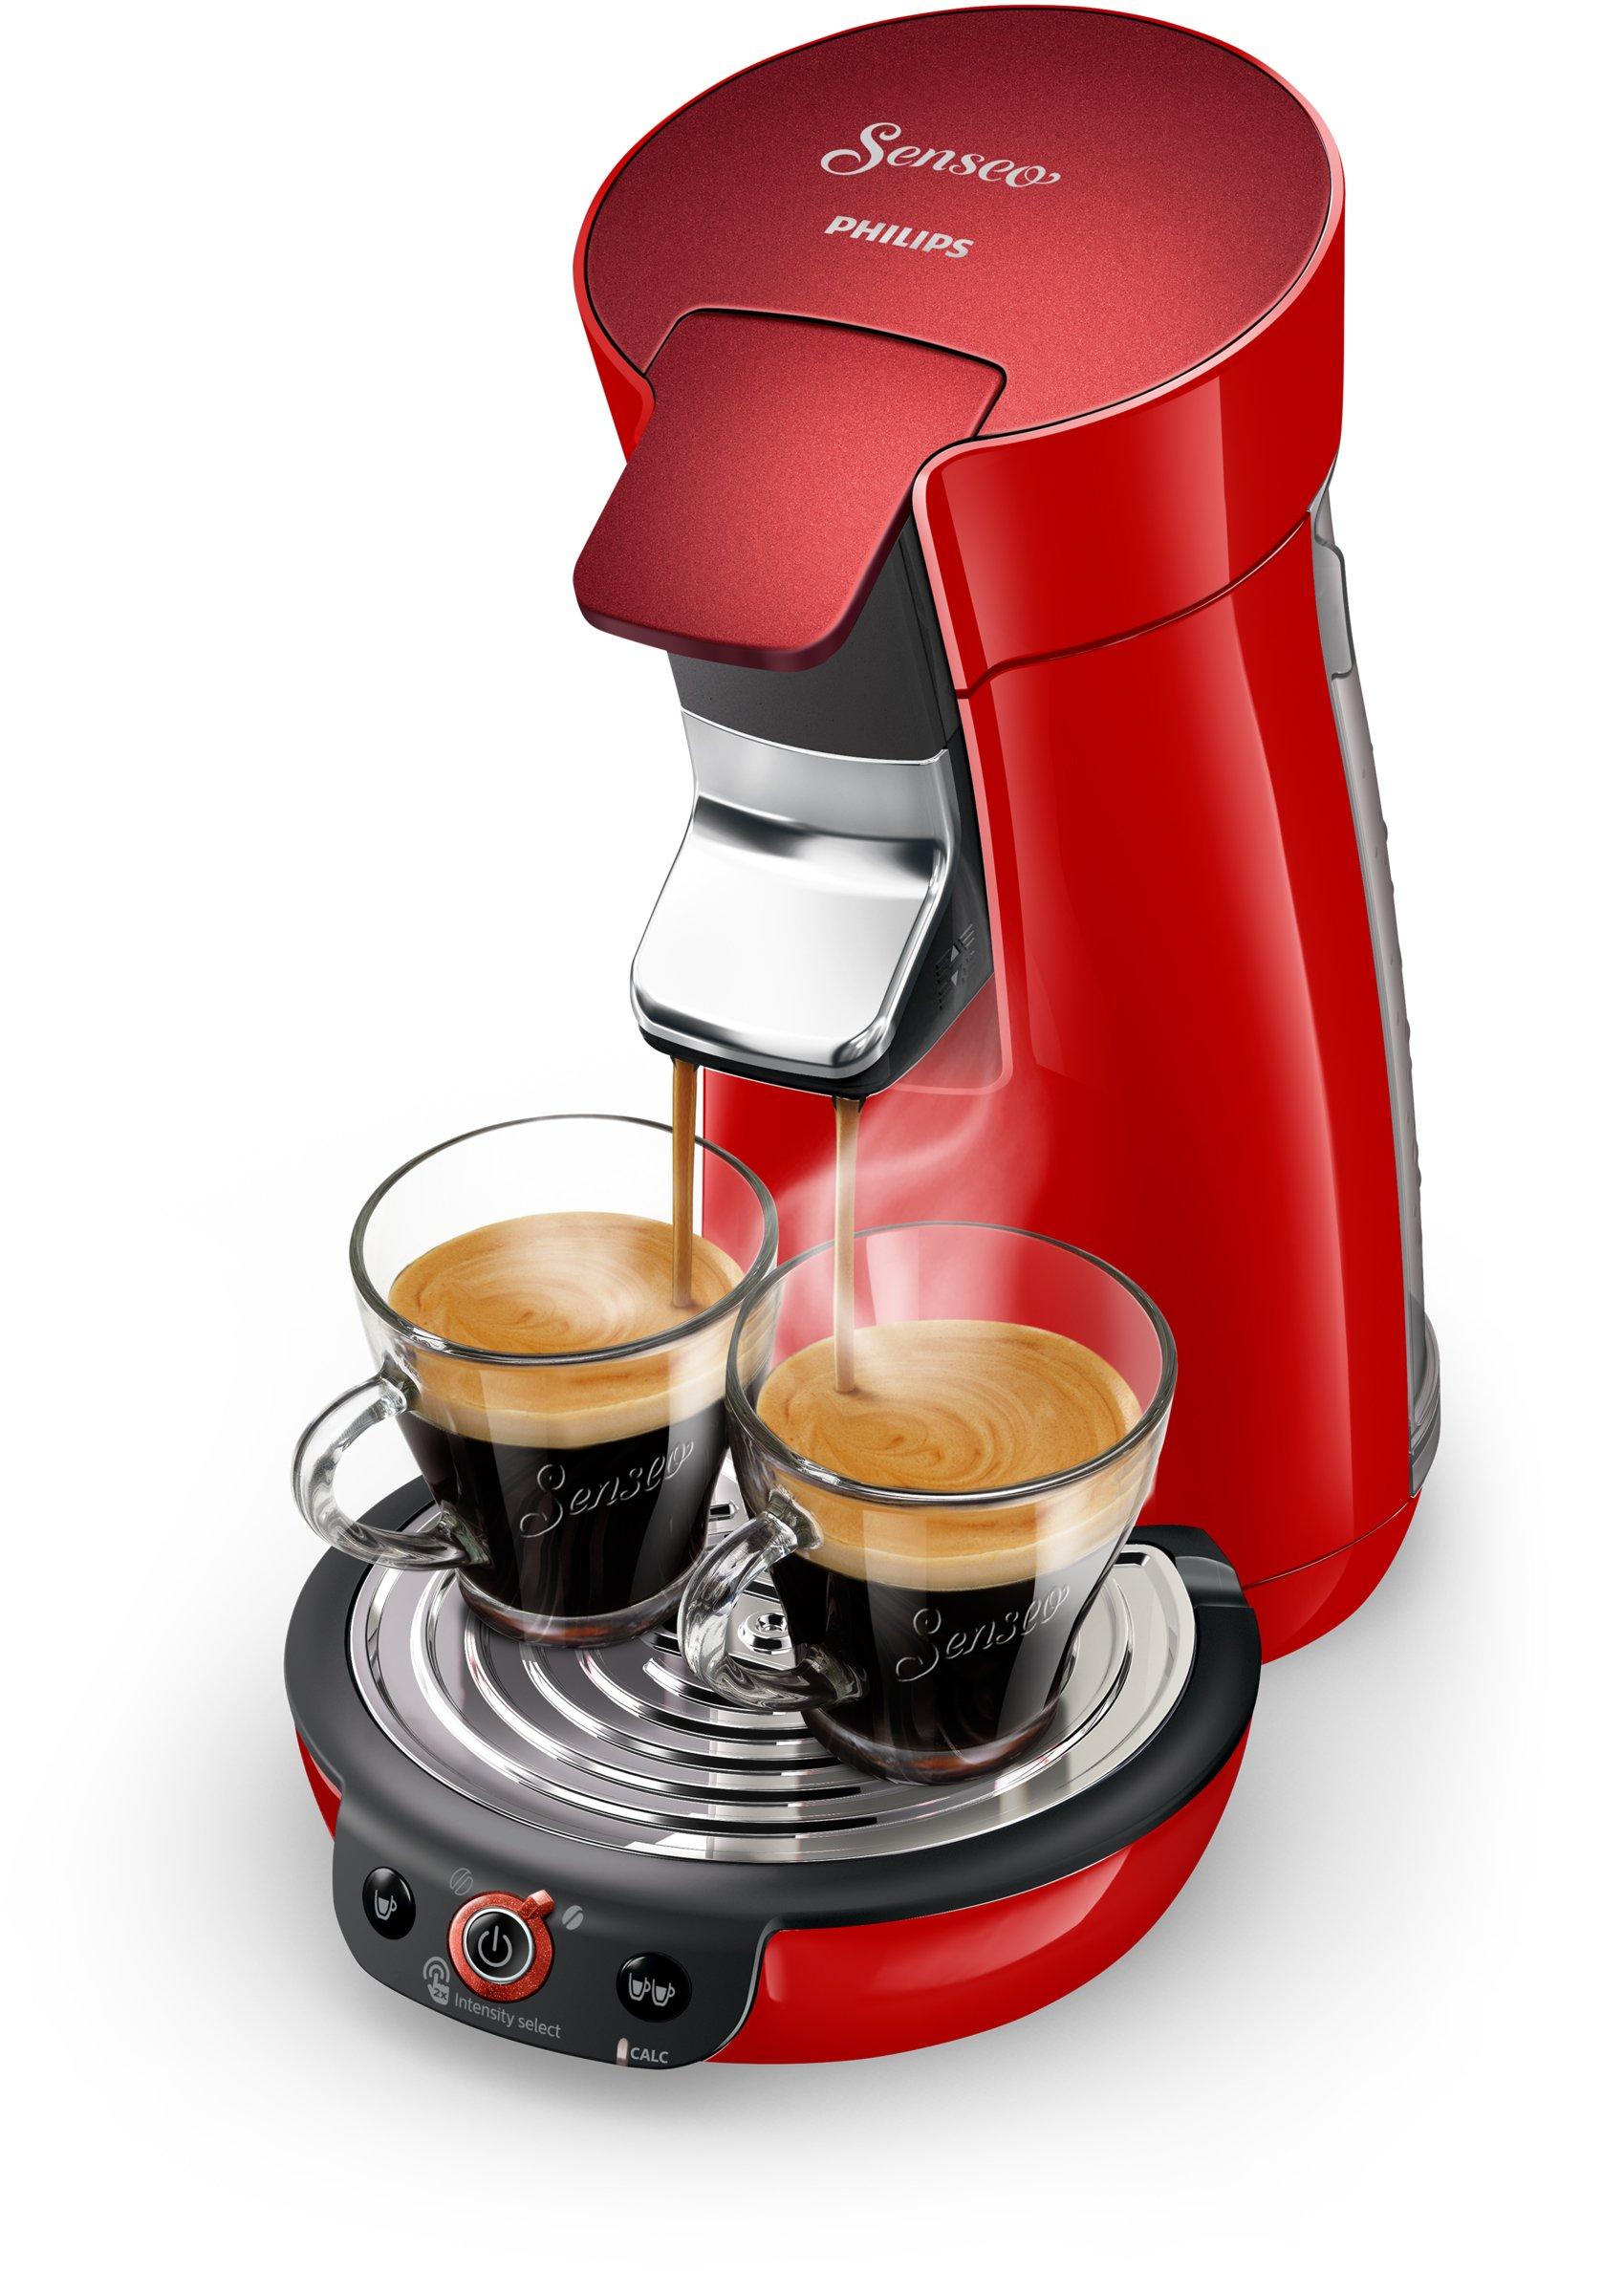 Philips-Senseo-HD656480Viva-Caf-Kaffeepadmaschine-1450-Rot